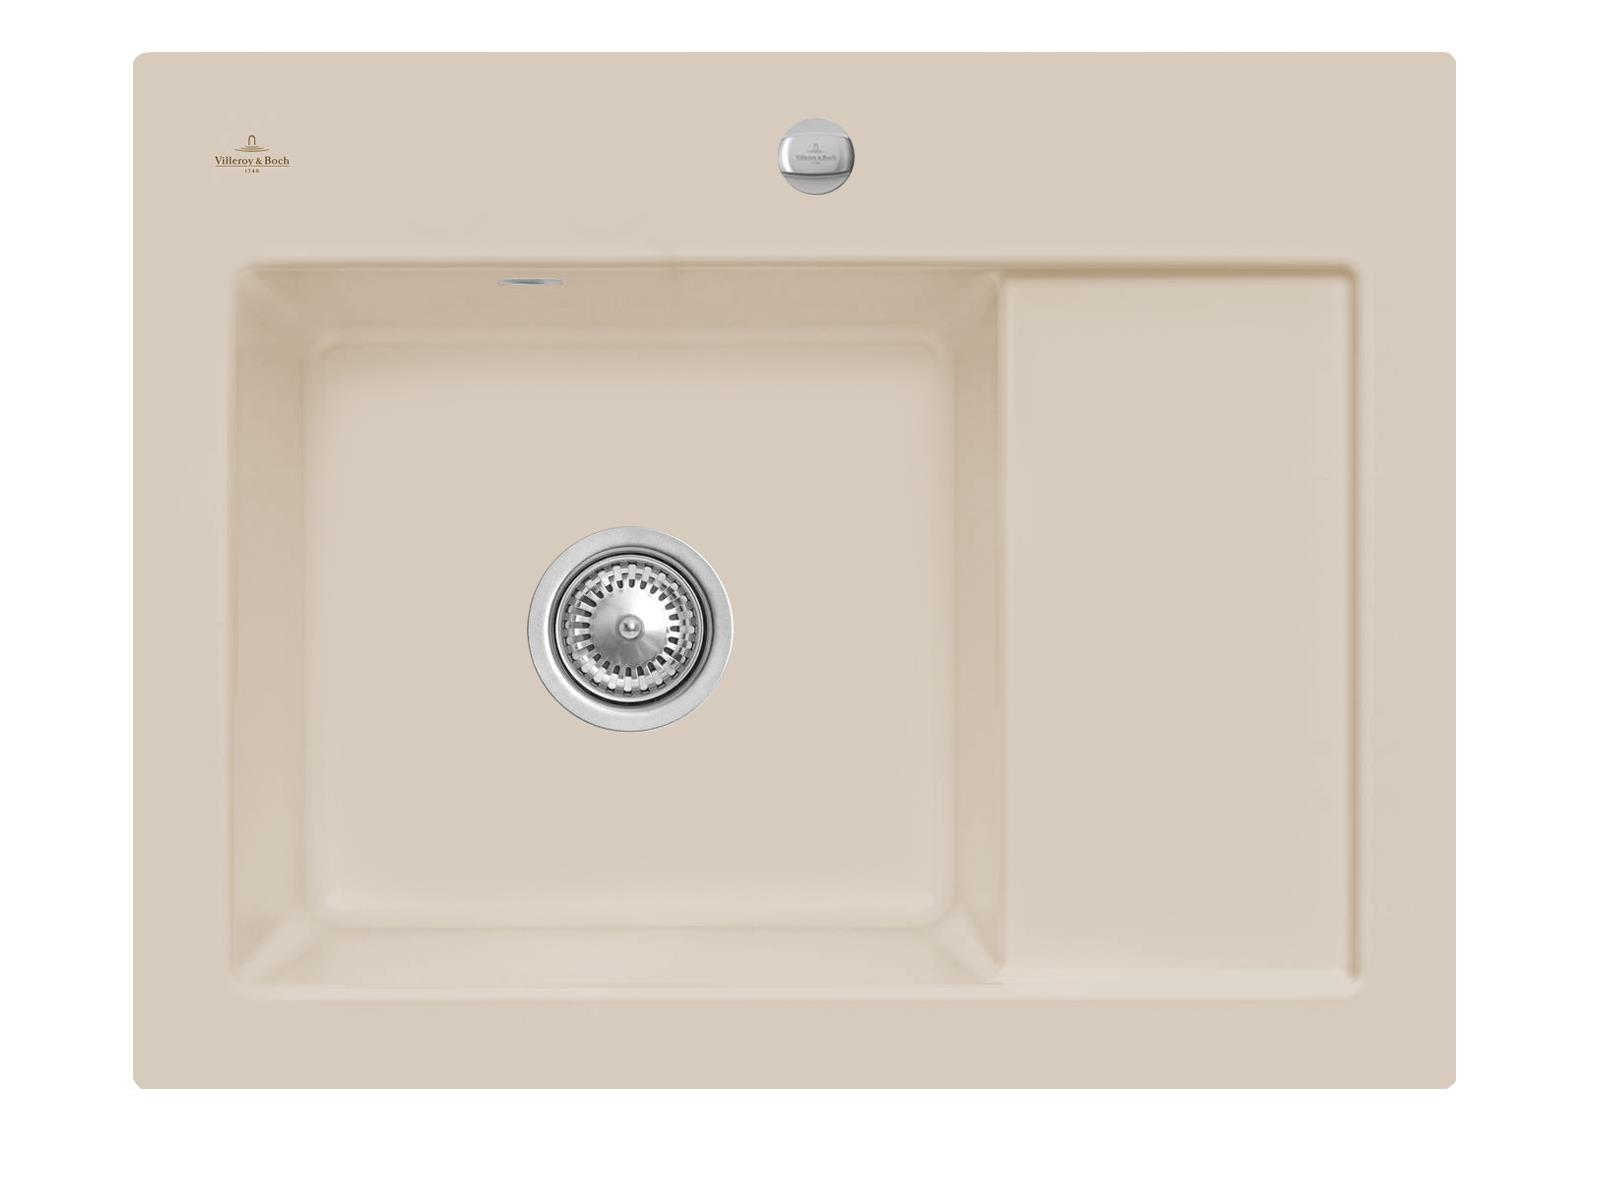 Villeroy & Boch Subway 45 Compact - 3312 02 AM Almond Keramikspüle Exzenterbetätigung